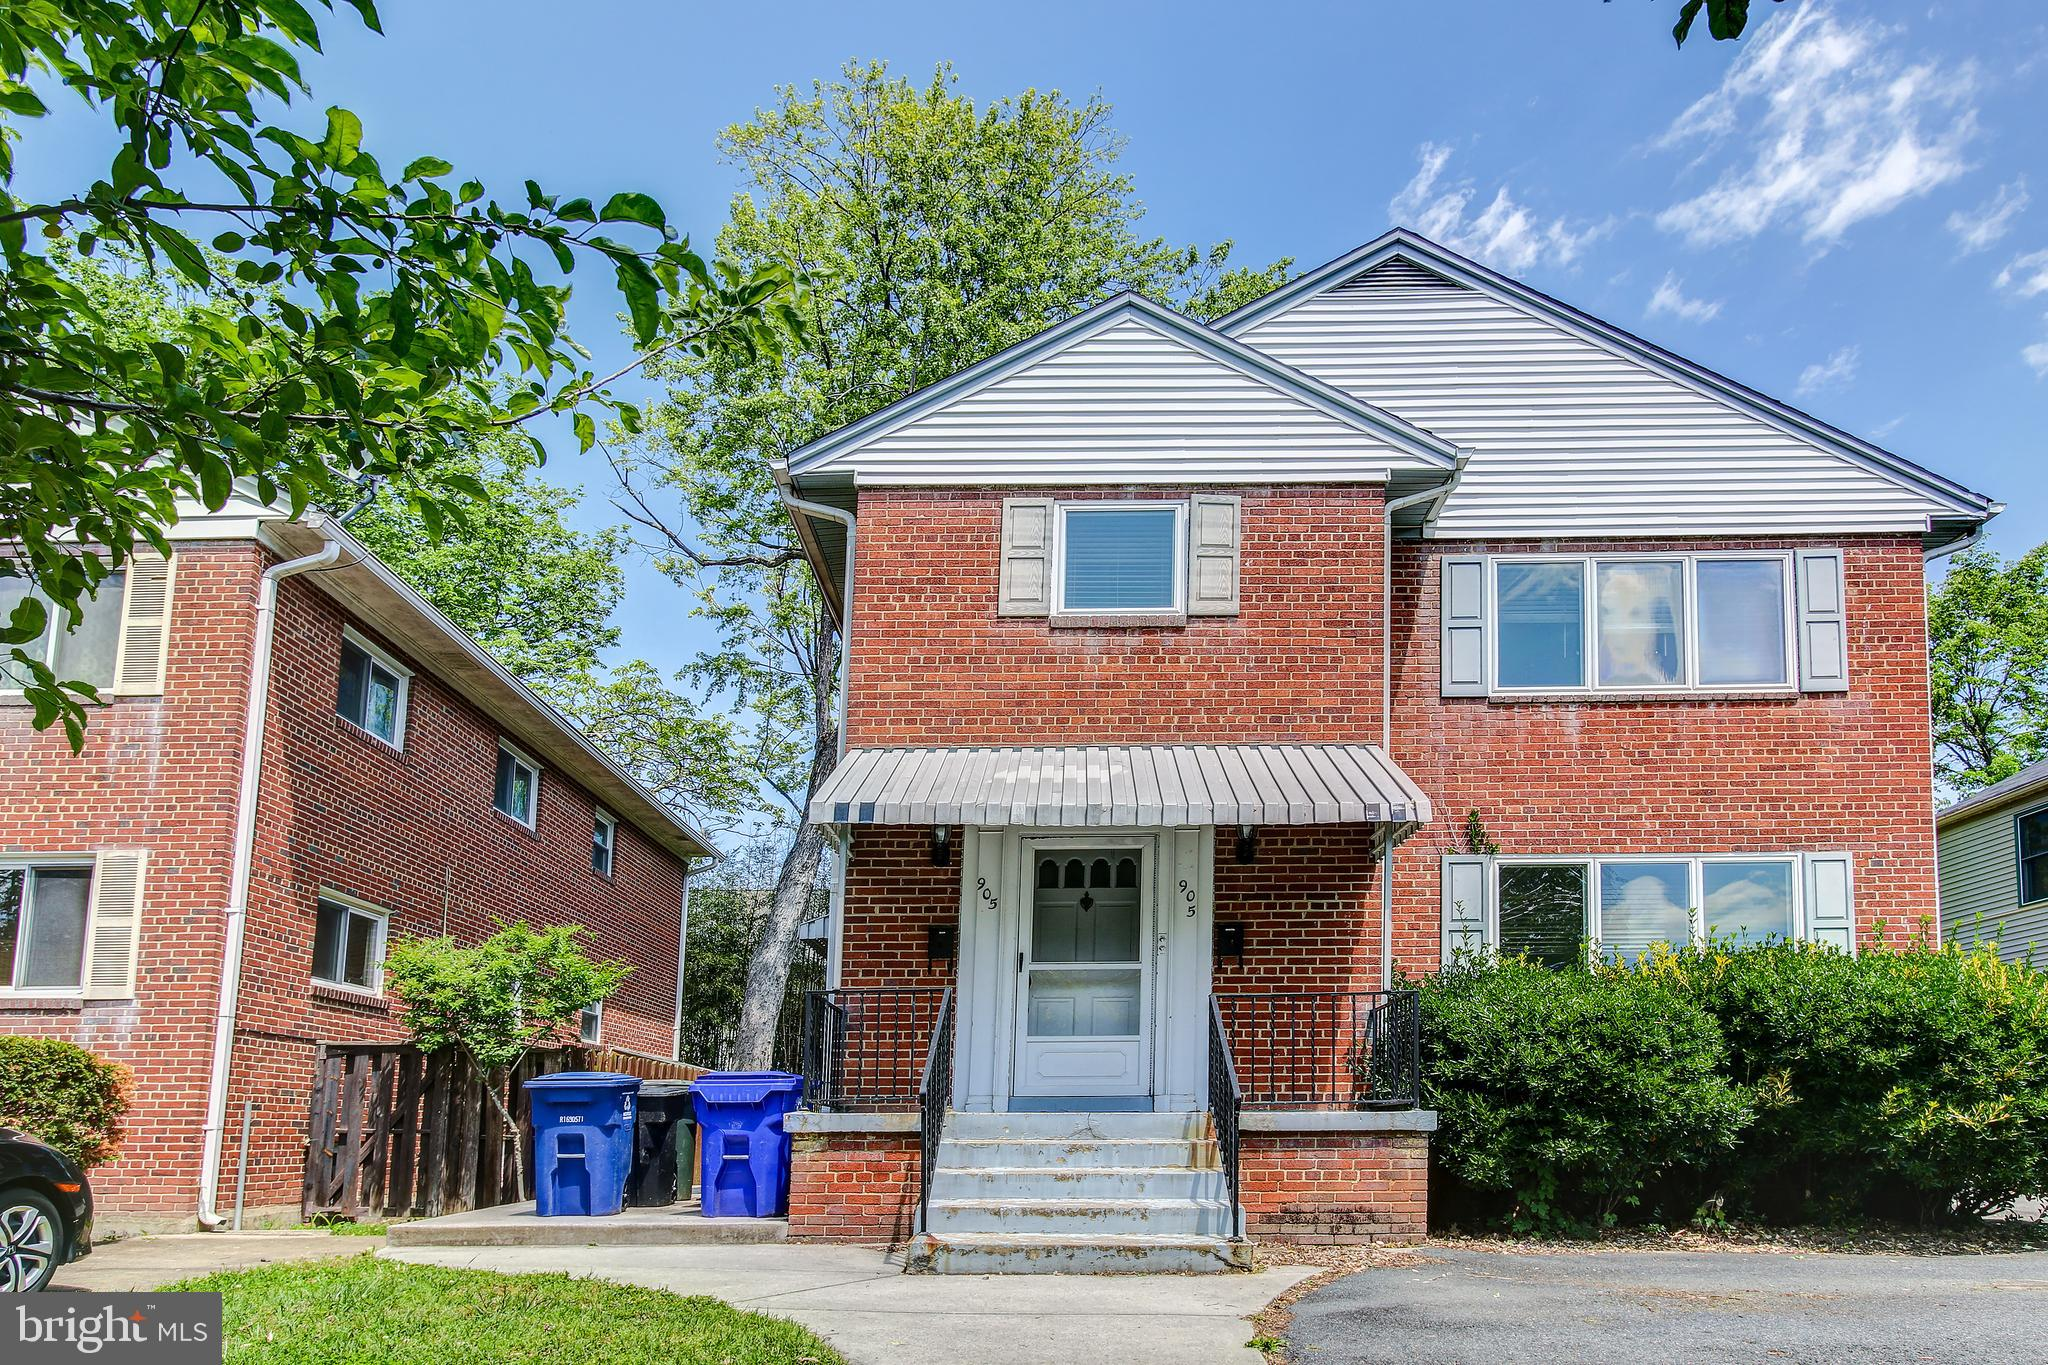 Arlington VA Homes For Sale, $850,000-$1,000,000